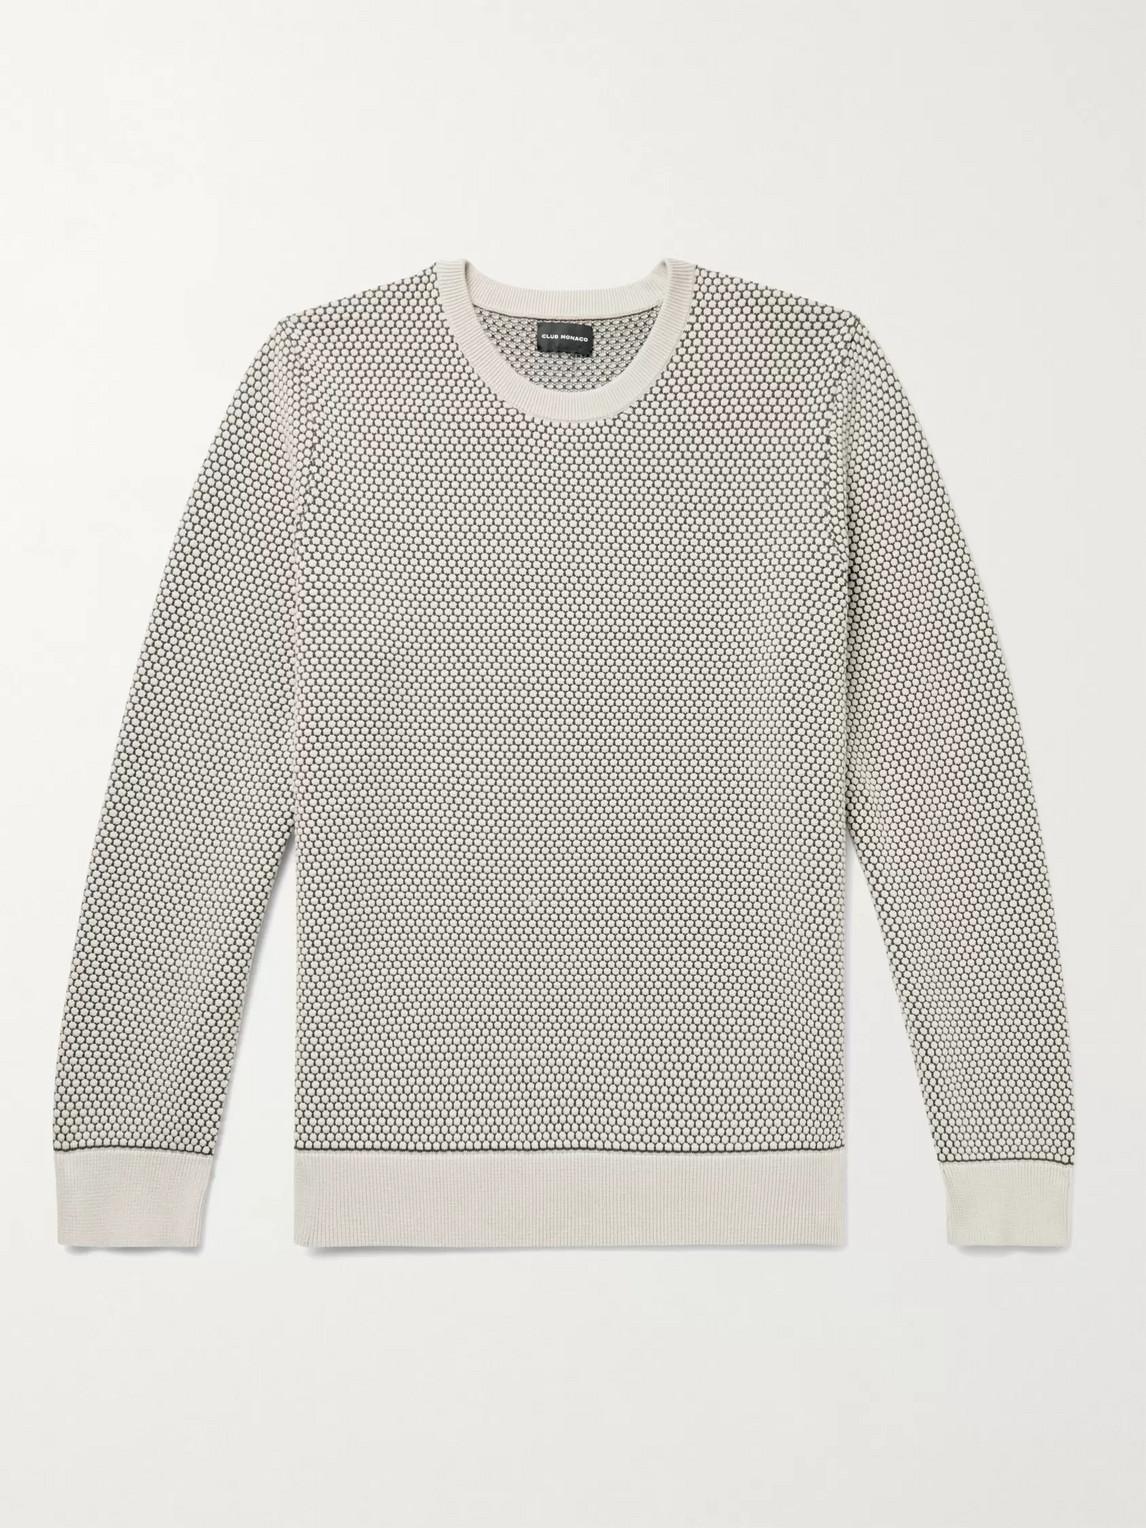 Club Monaco Oatmeal Honeycomb Knit Crewneck Sweater In Size M